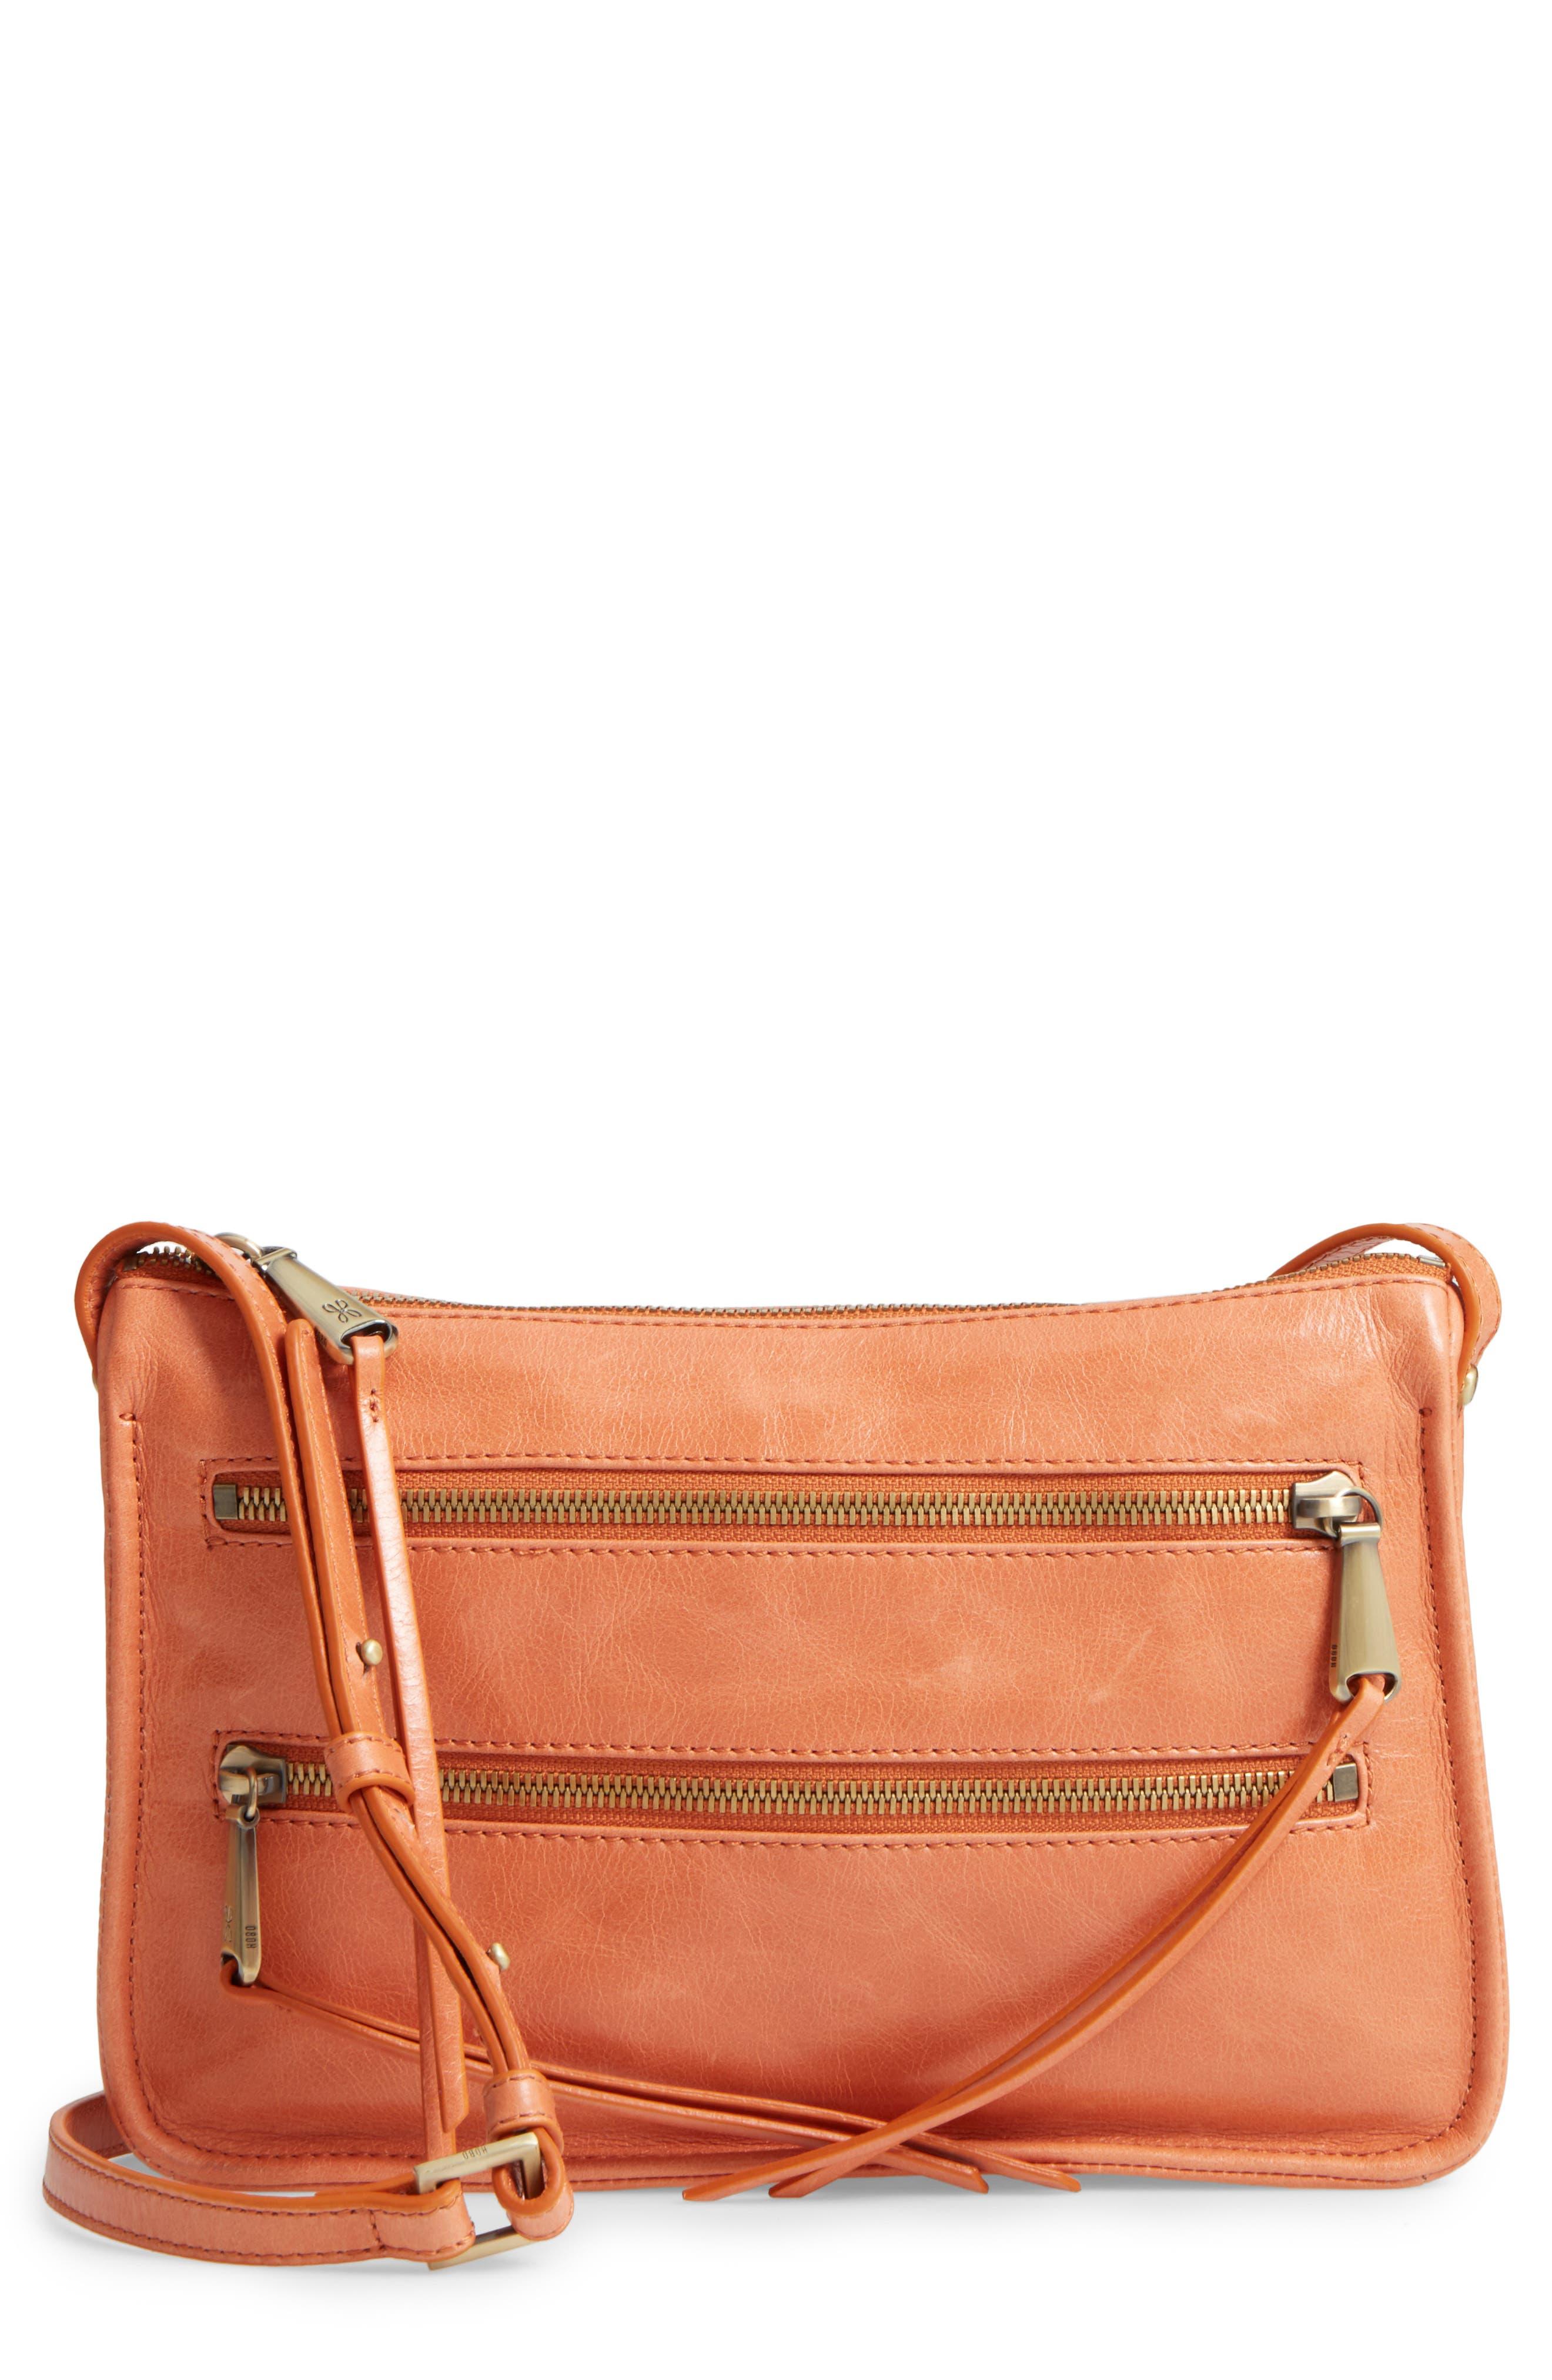 Main Image - Hobo Mission Leather Crossbody Bag